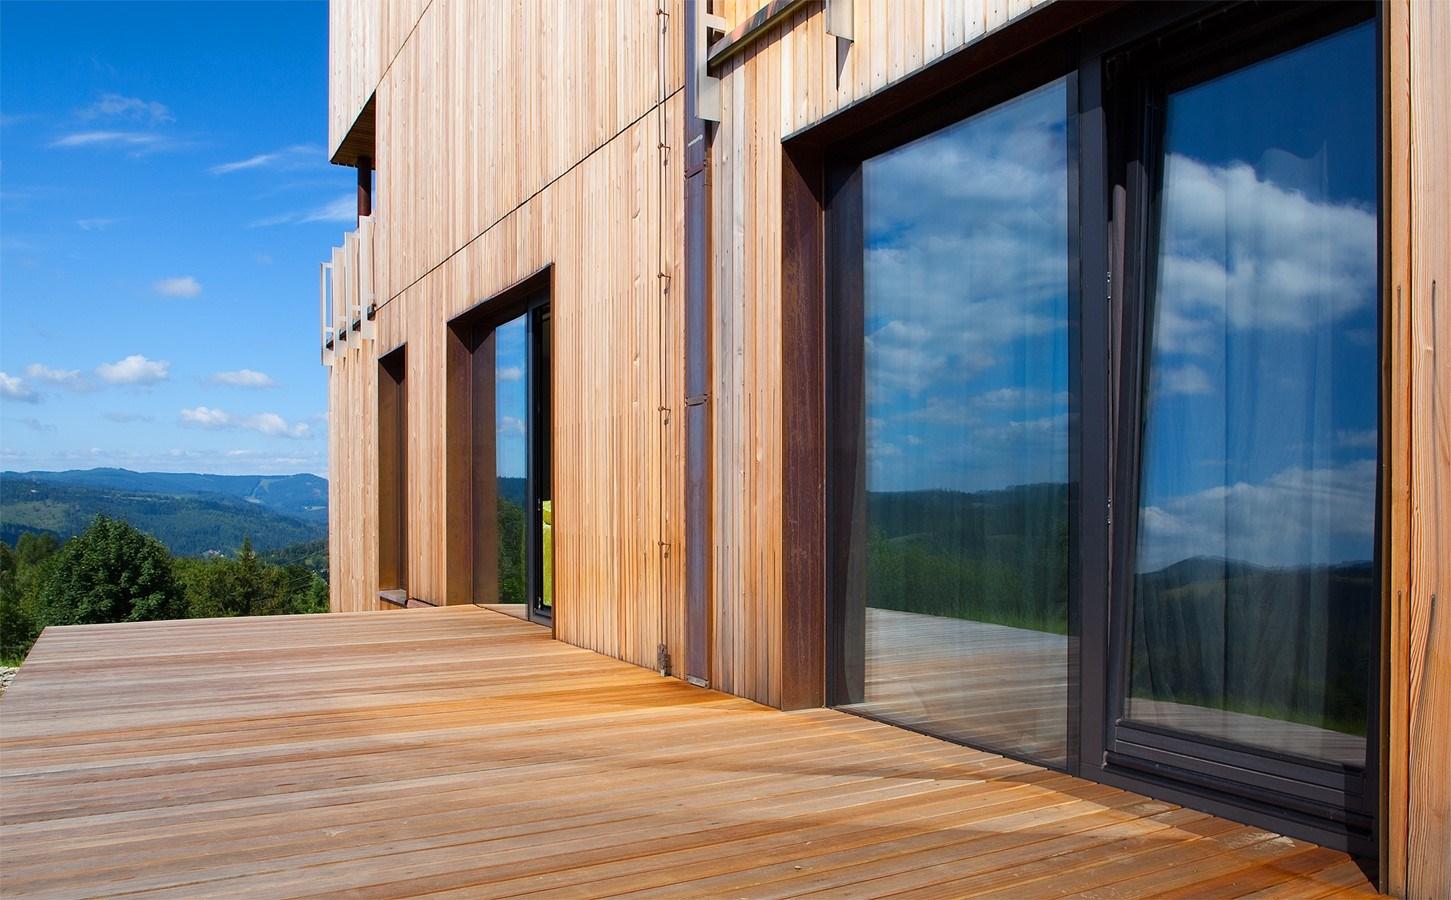 Drewniany taras nowoczesnego domu - HomeSquare